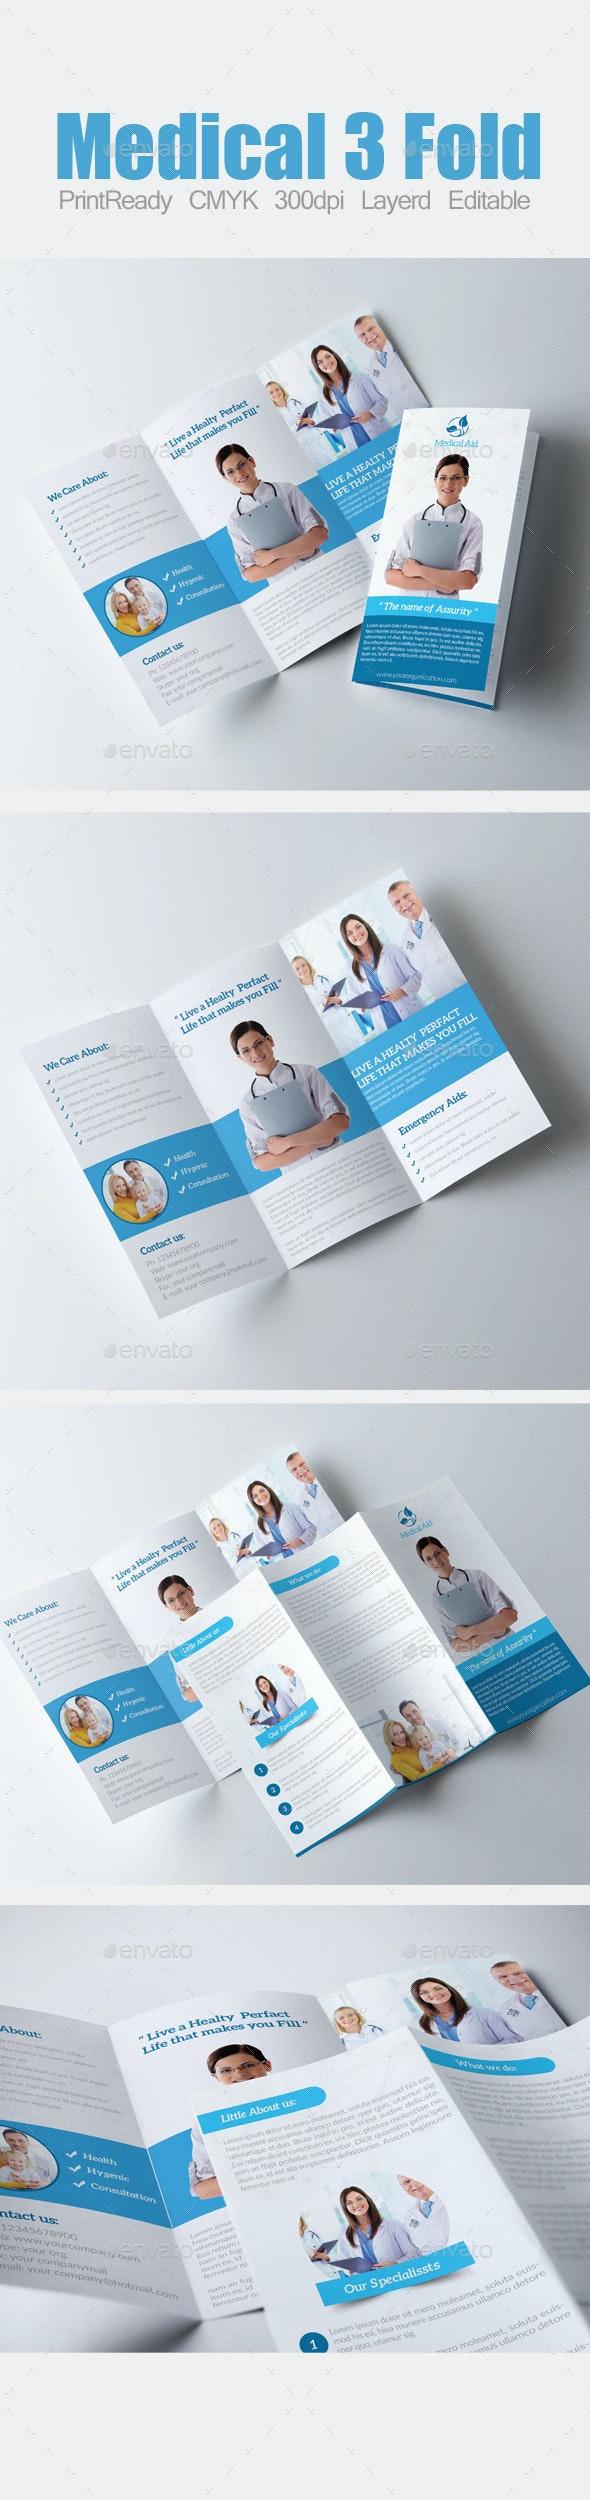 3 Fold Business Brochure - Corporate Brochures